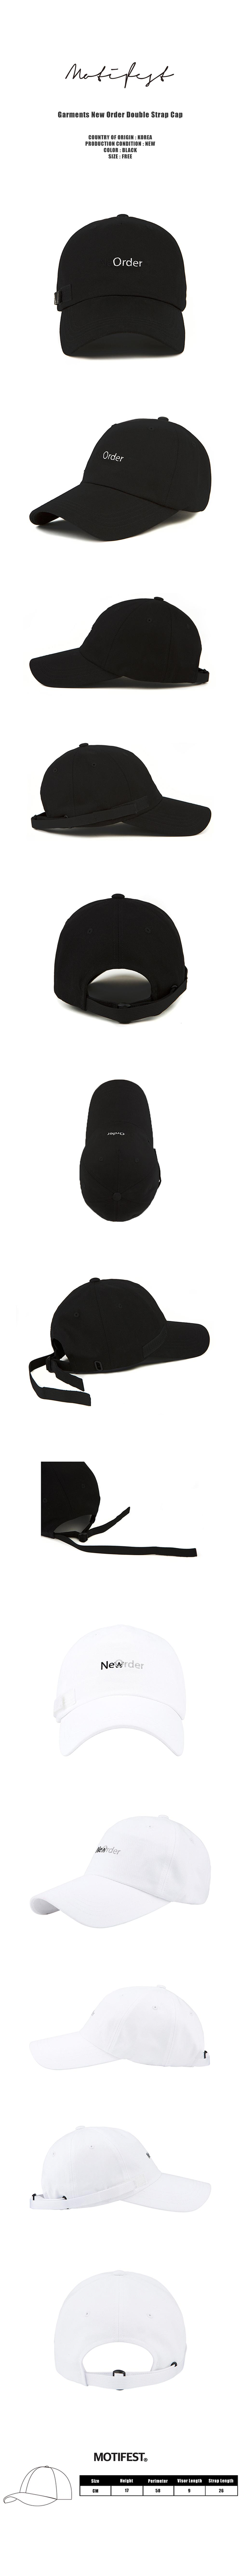 Garments-New-Order-Double-Strap-Cap-1+1-D.jpg